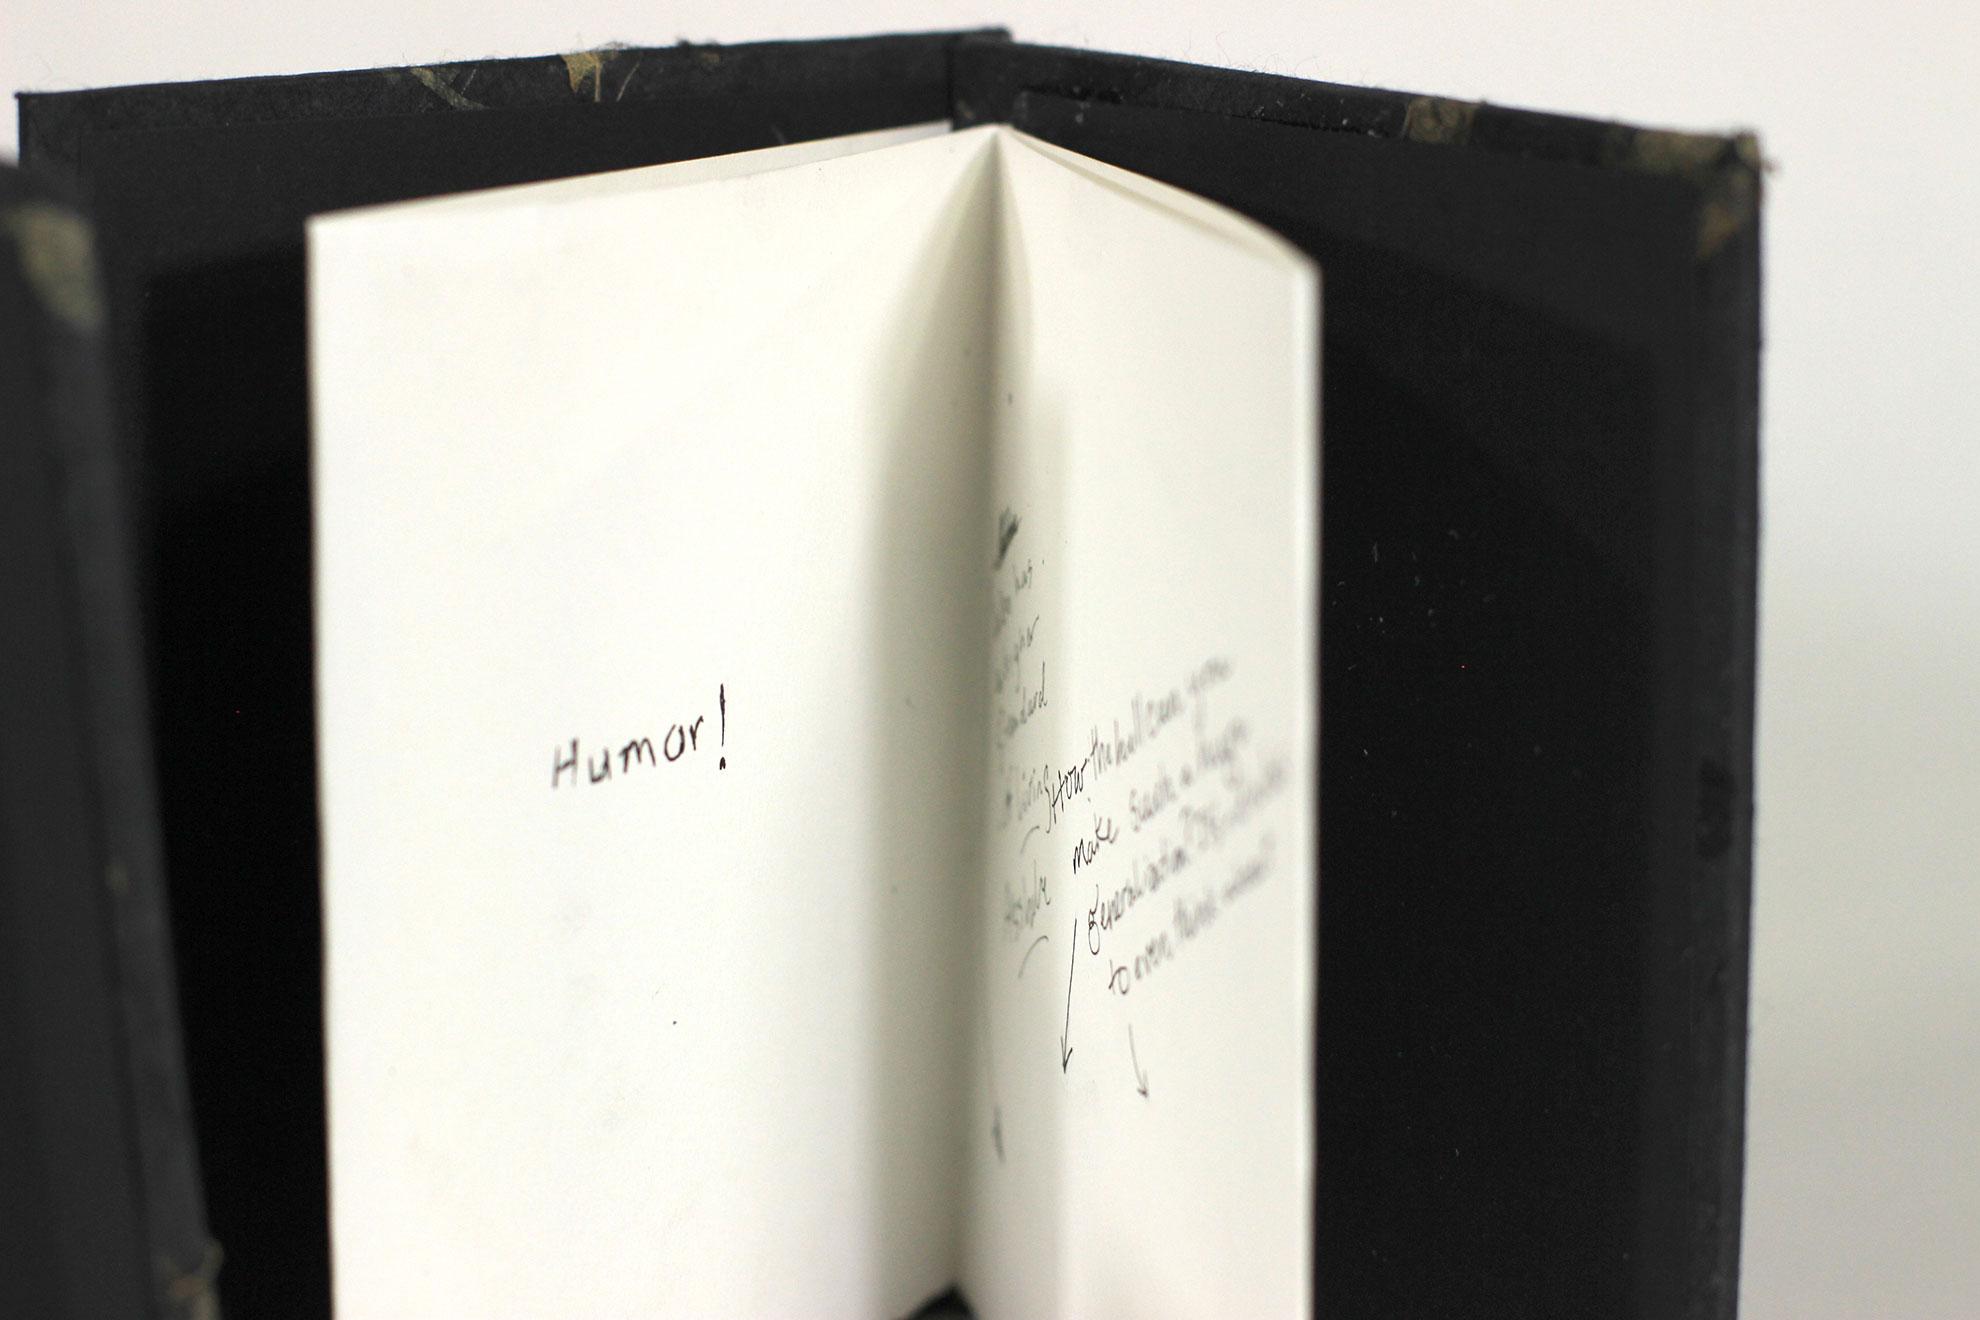 Brooks K Eisenbise, Ann Arbor, Walking Tour, Four books, Ink, Linocut, 2018, $50/ea,